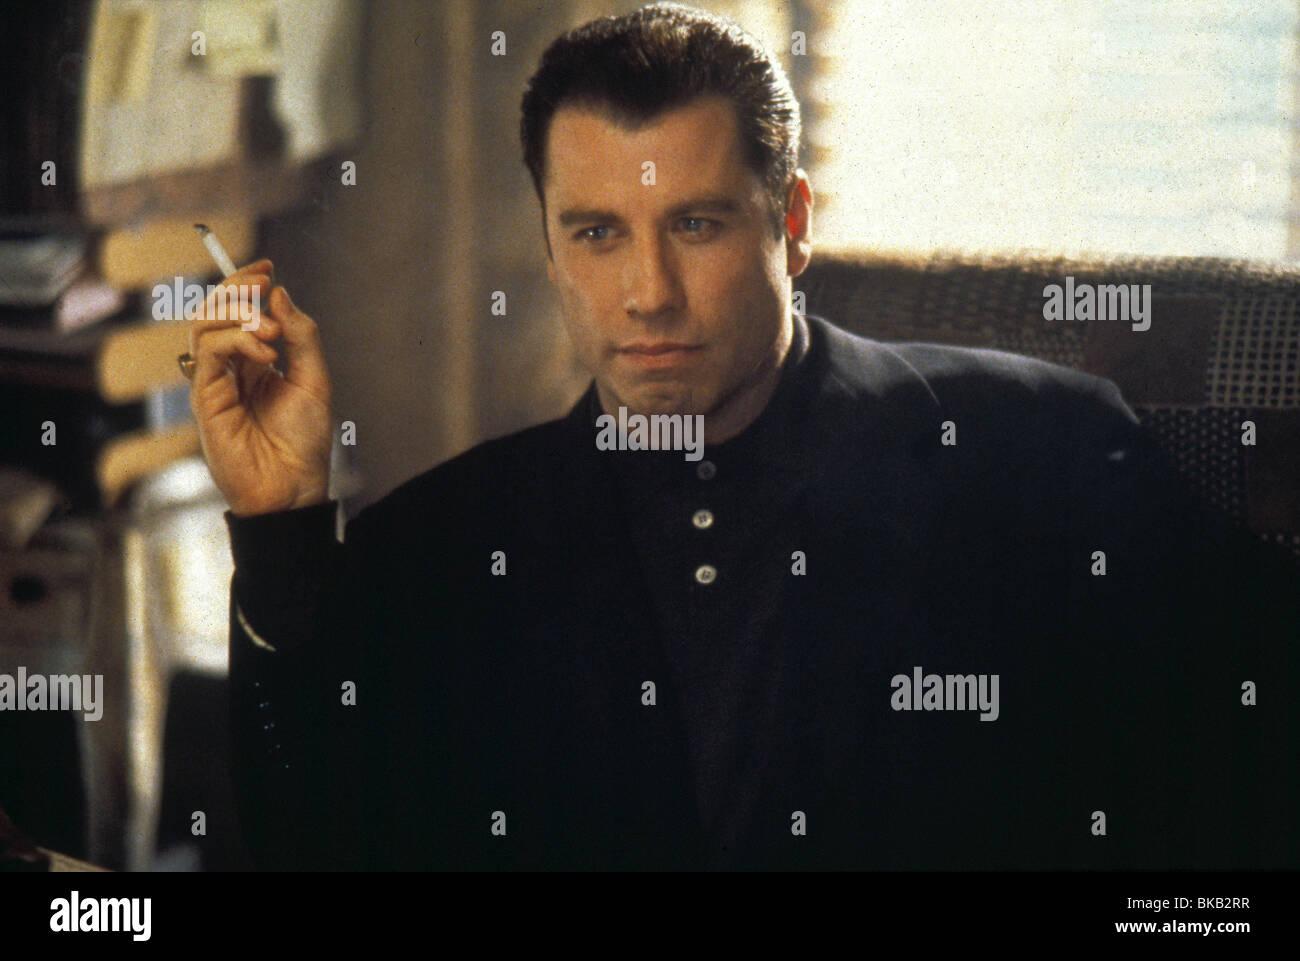 GET SHORTY -1995 JOHN TRAVOLTA - Stock Image